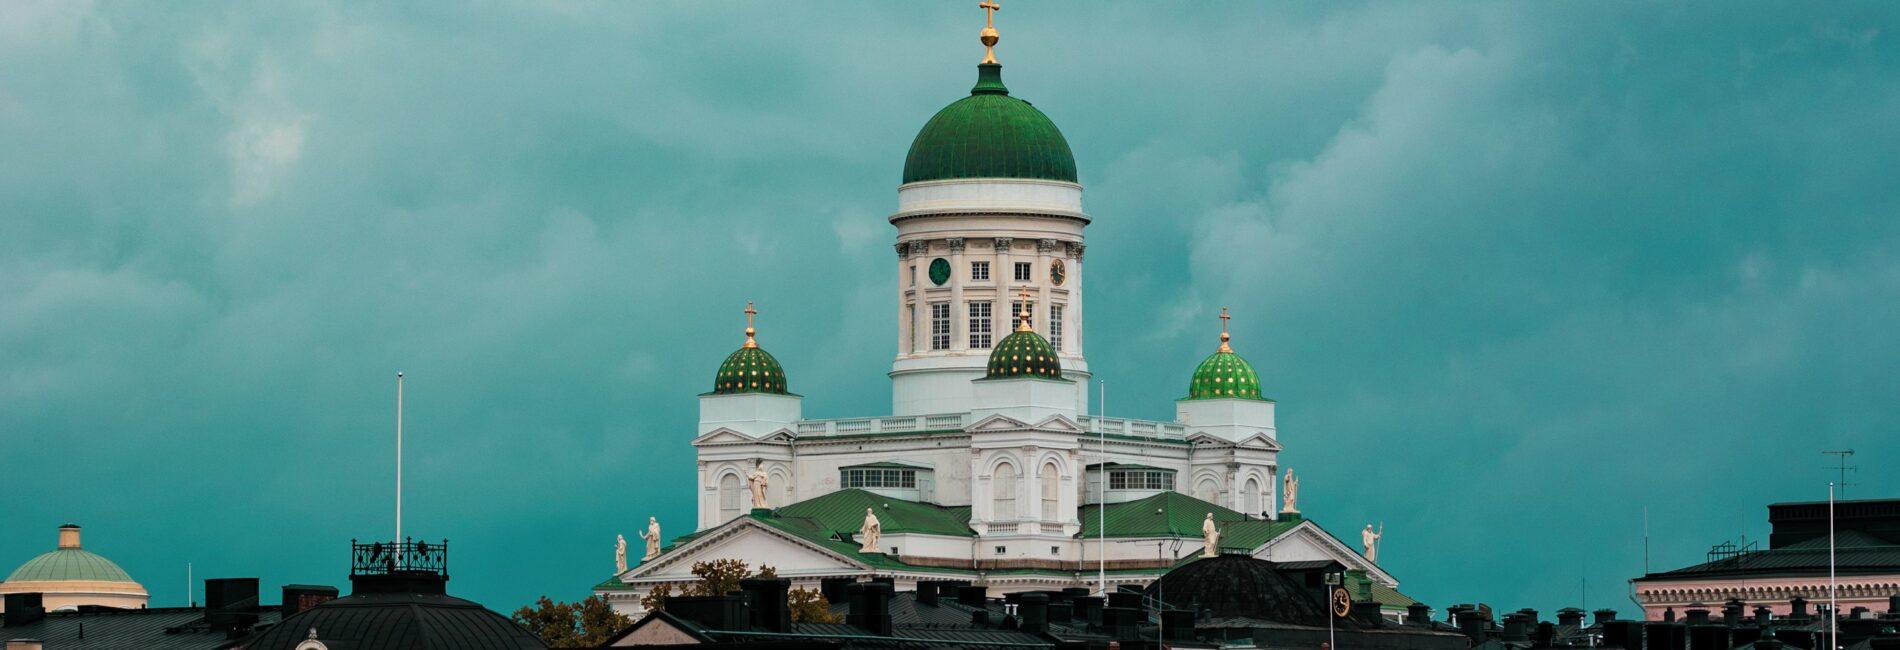 Discover the Finnish contemporary art scene in Helsinki